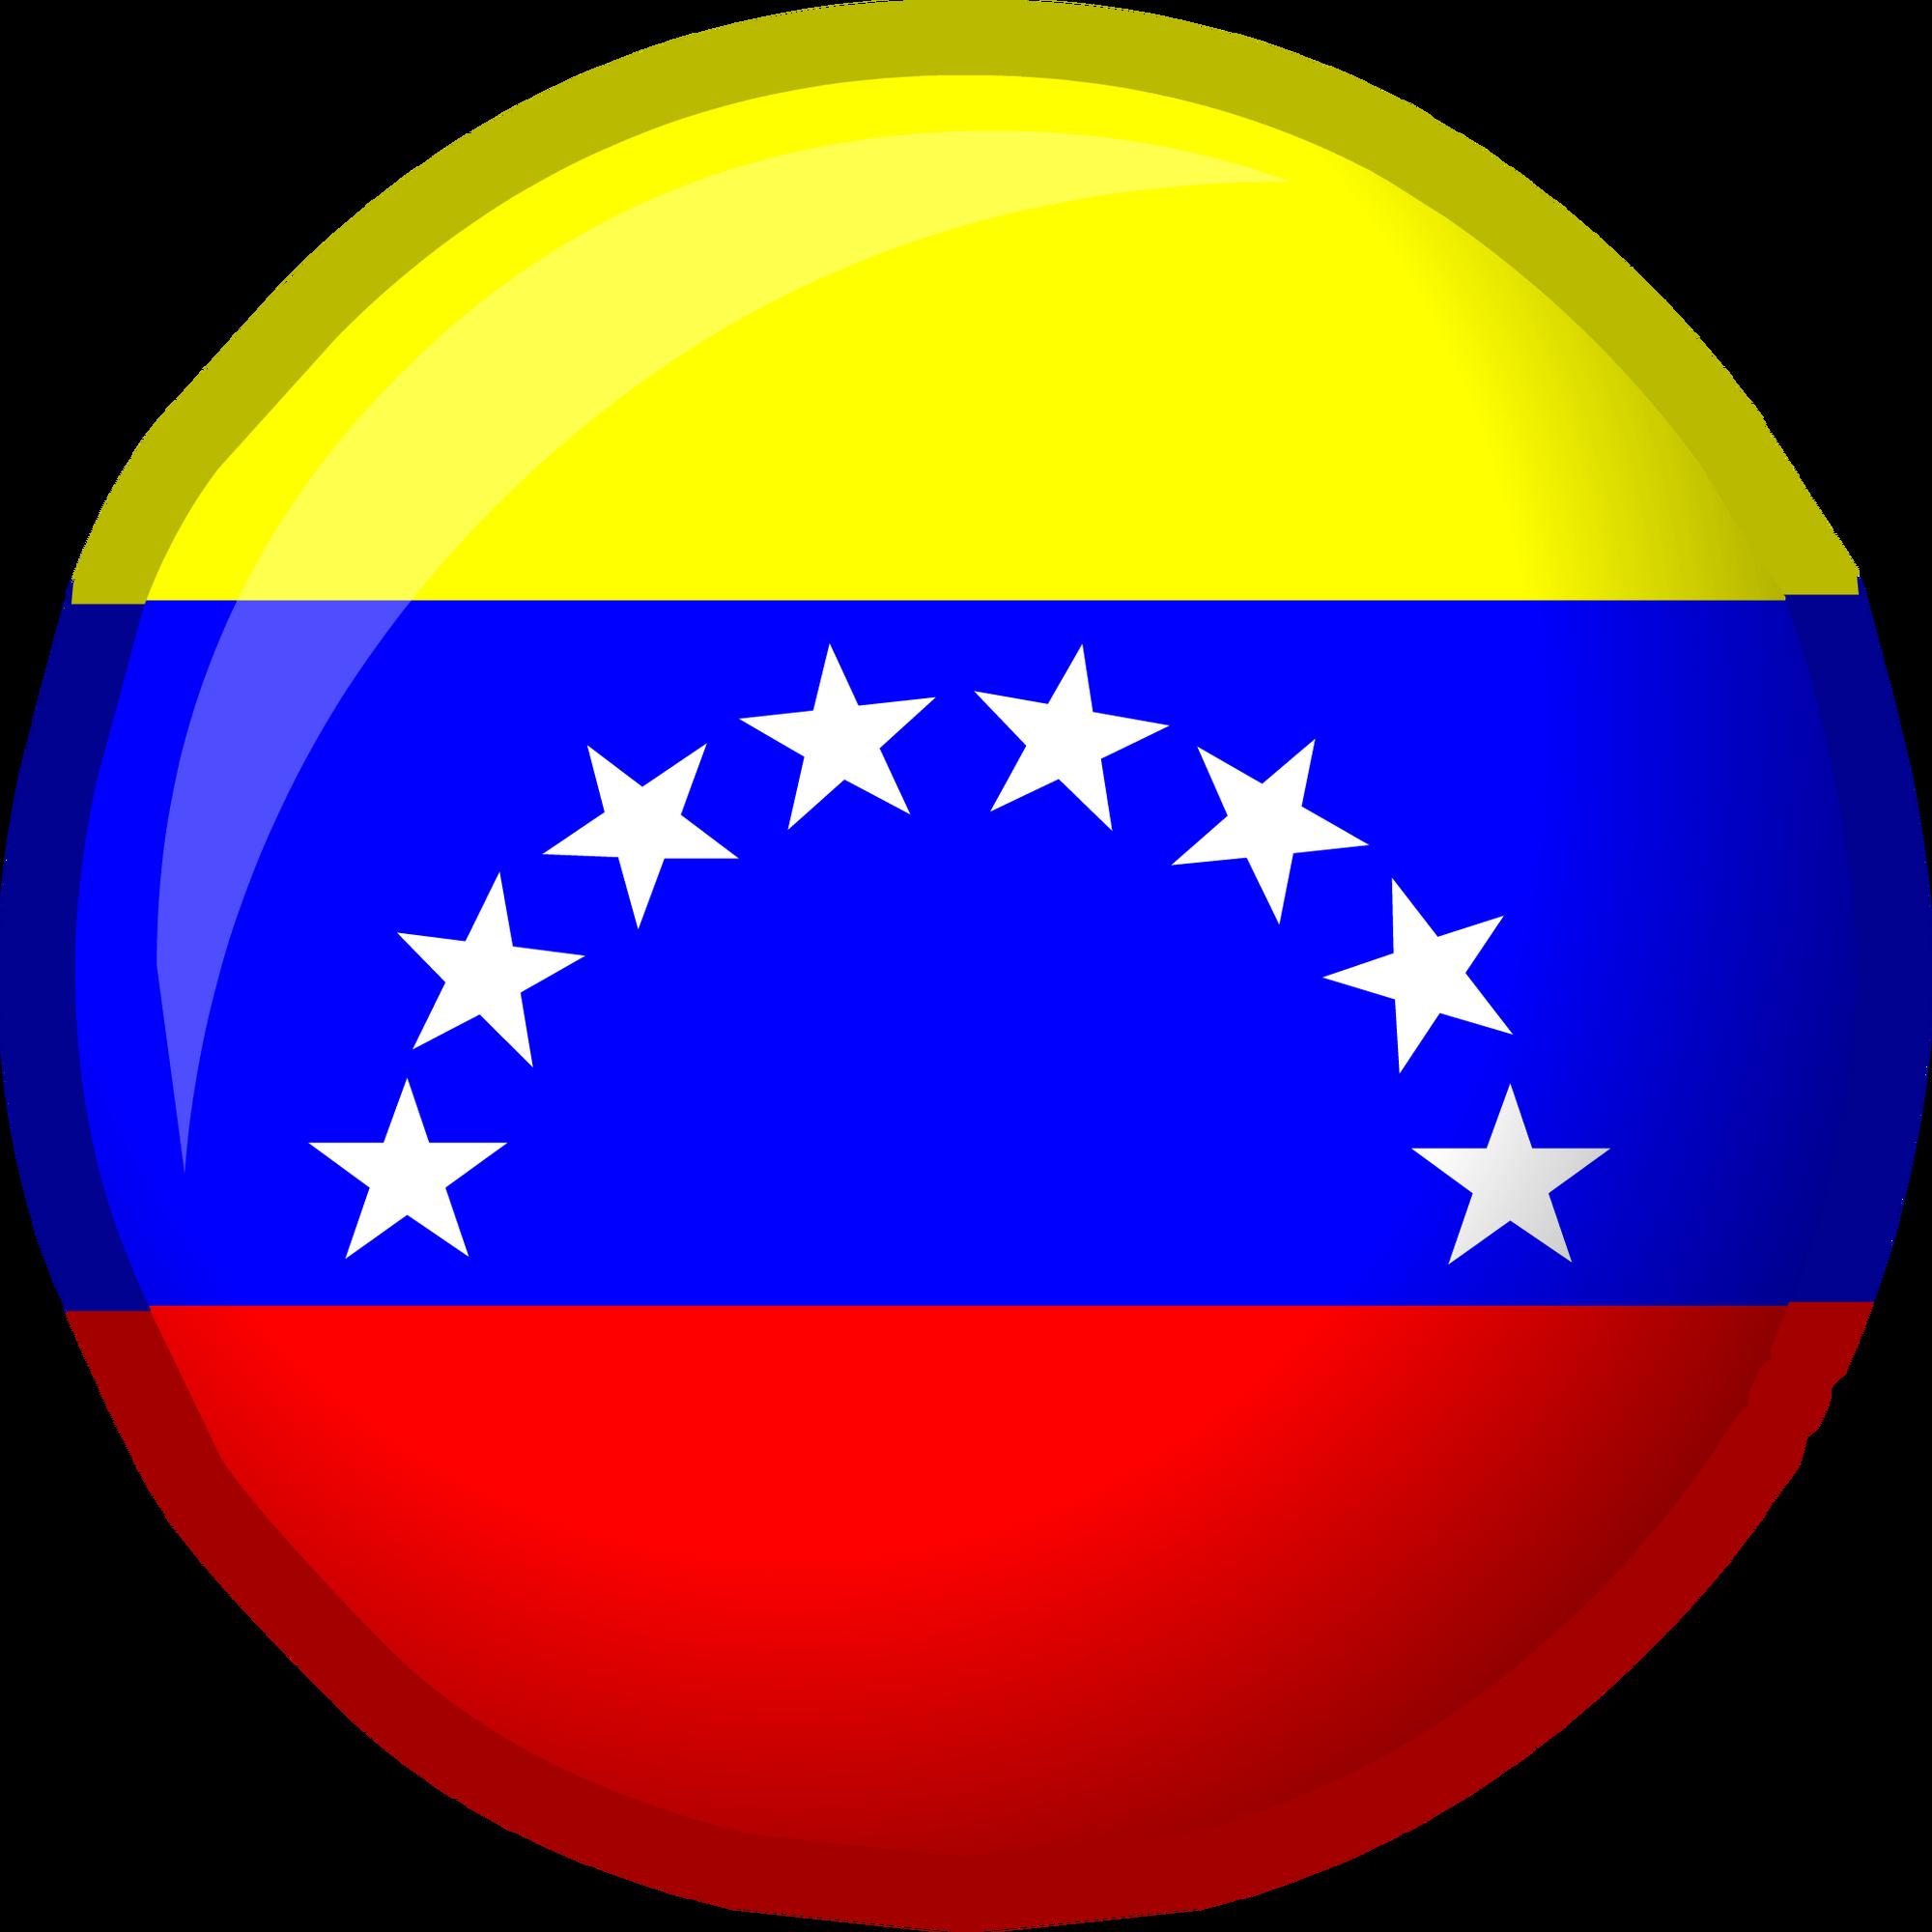 Venezuela flag club penguin wiki fandom powered by wikia pronofoot35fo Gallery